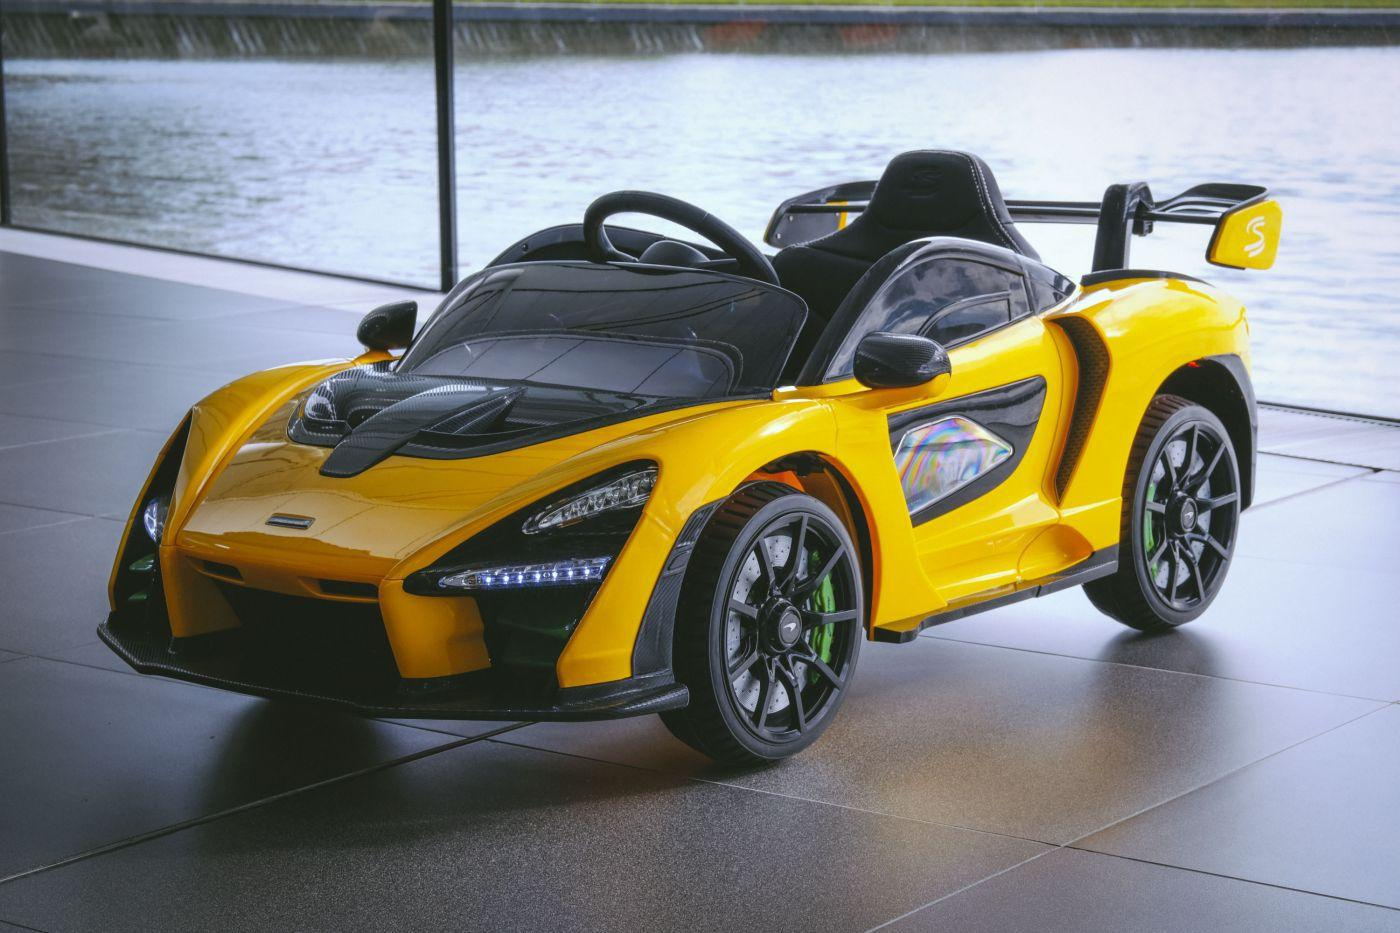 McLaren Senna Toy electric